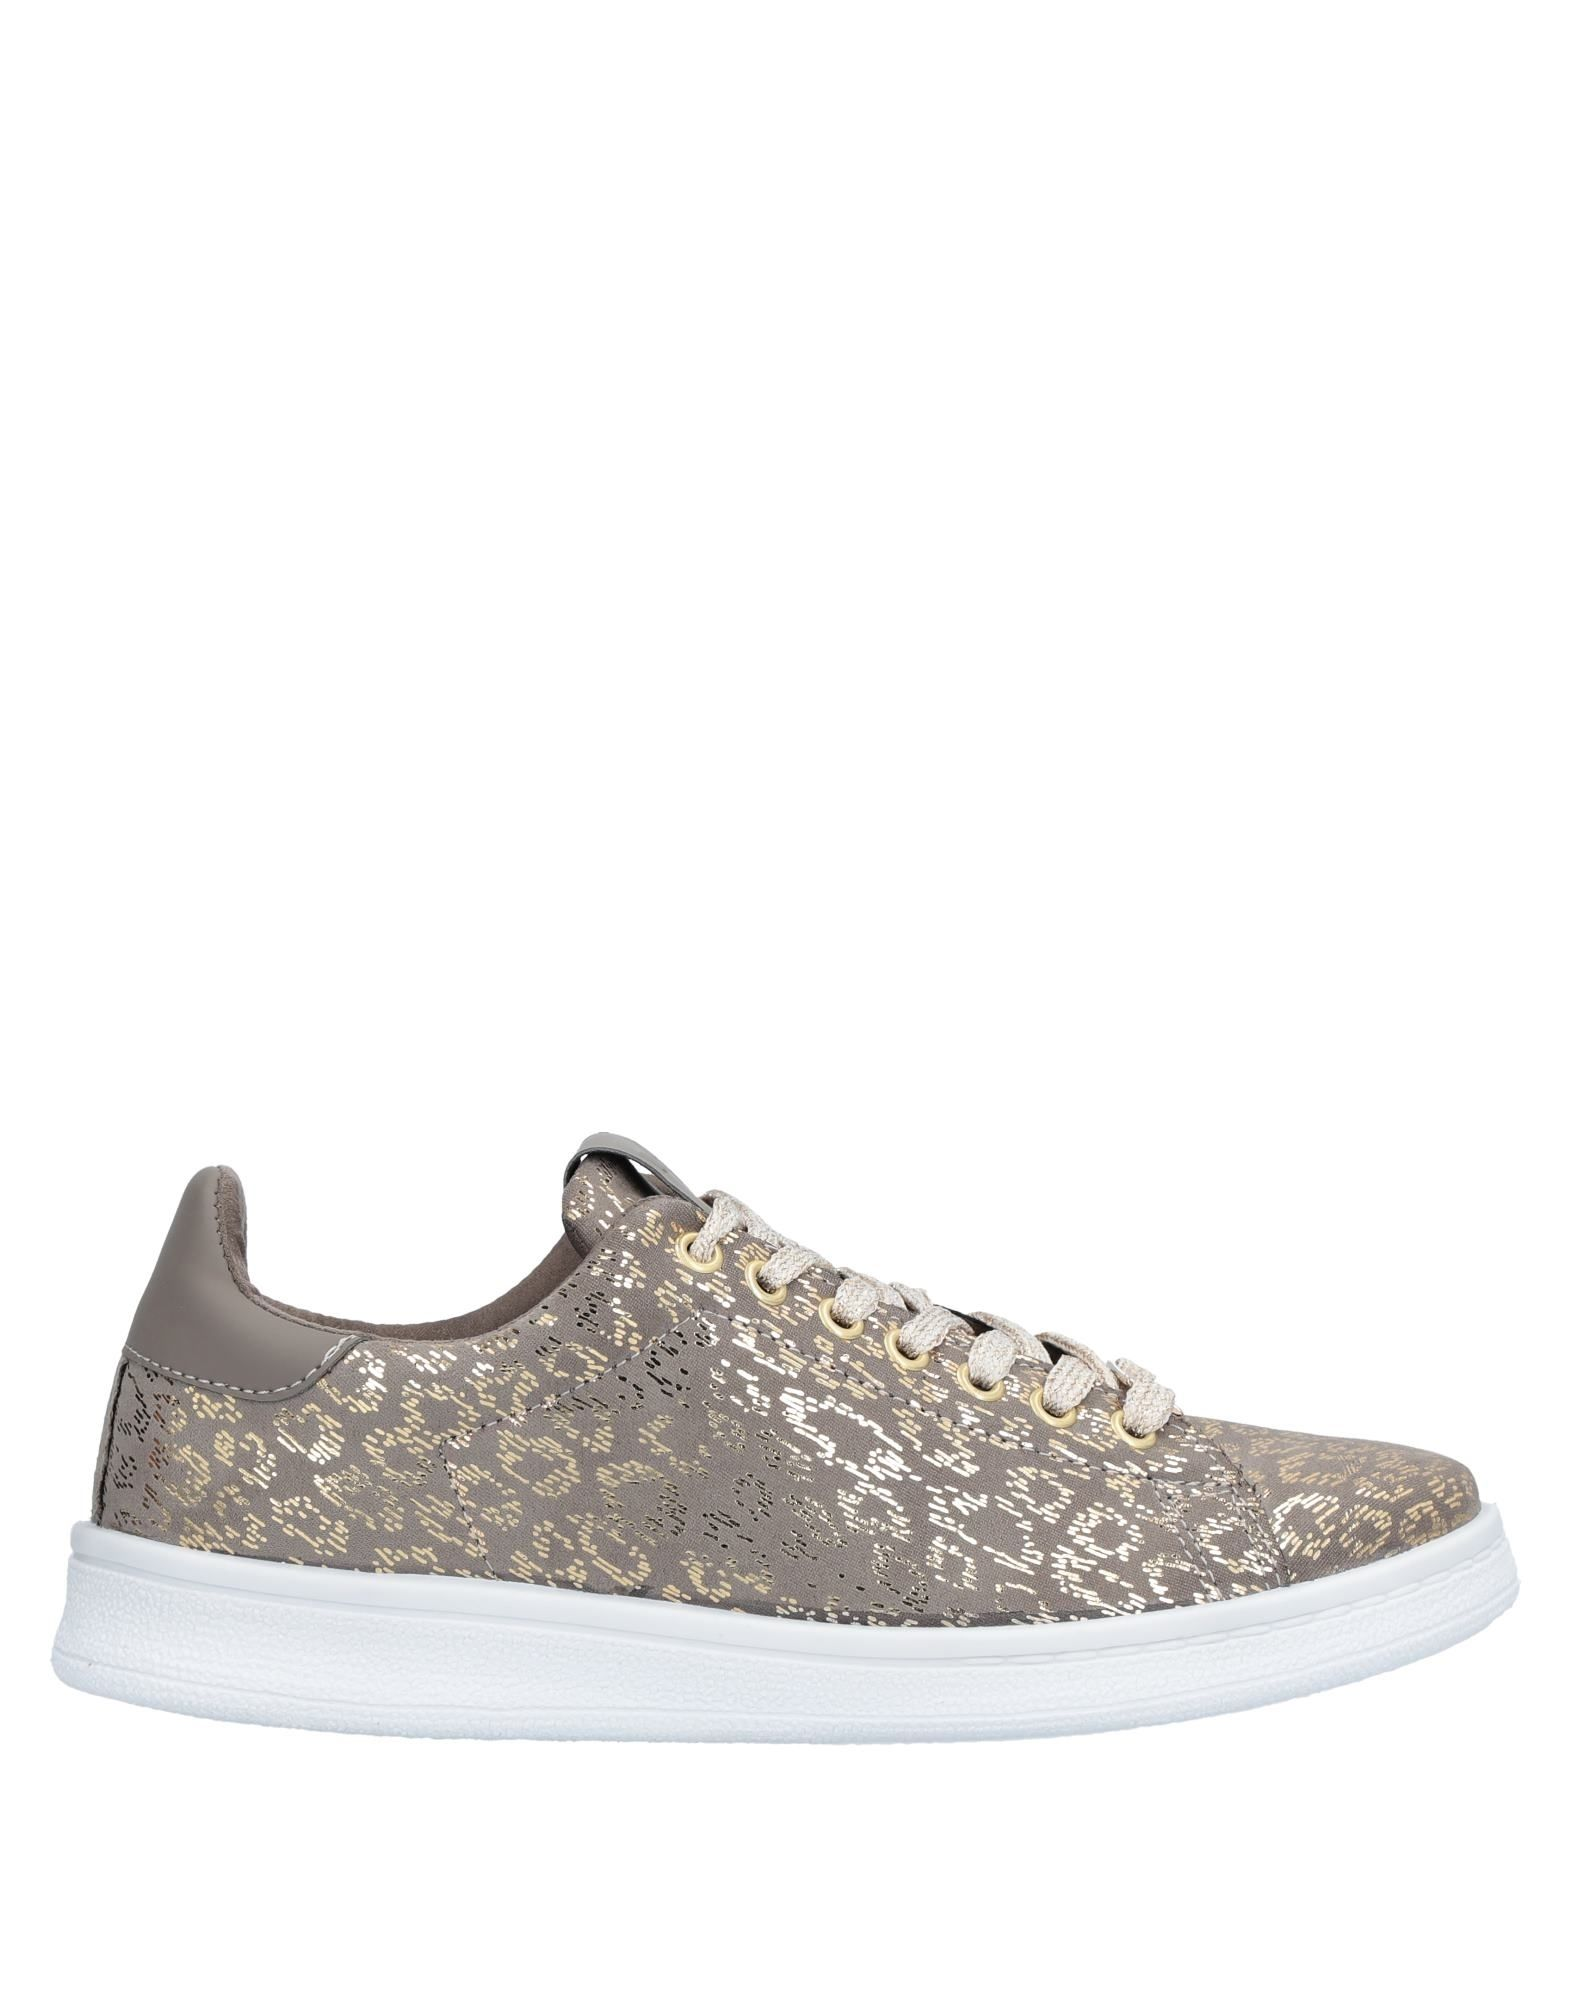 Liu •Jo Shoes Sneakers Damen  11529542CO Gute Qualität beliebte Schuhe